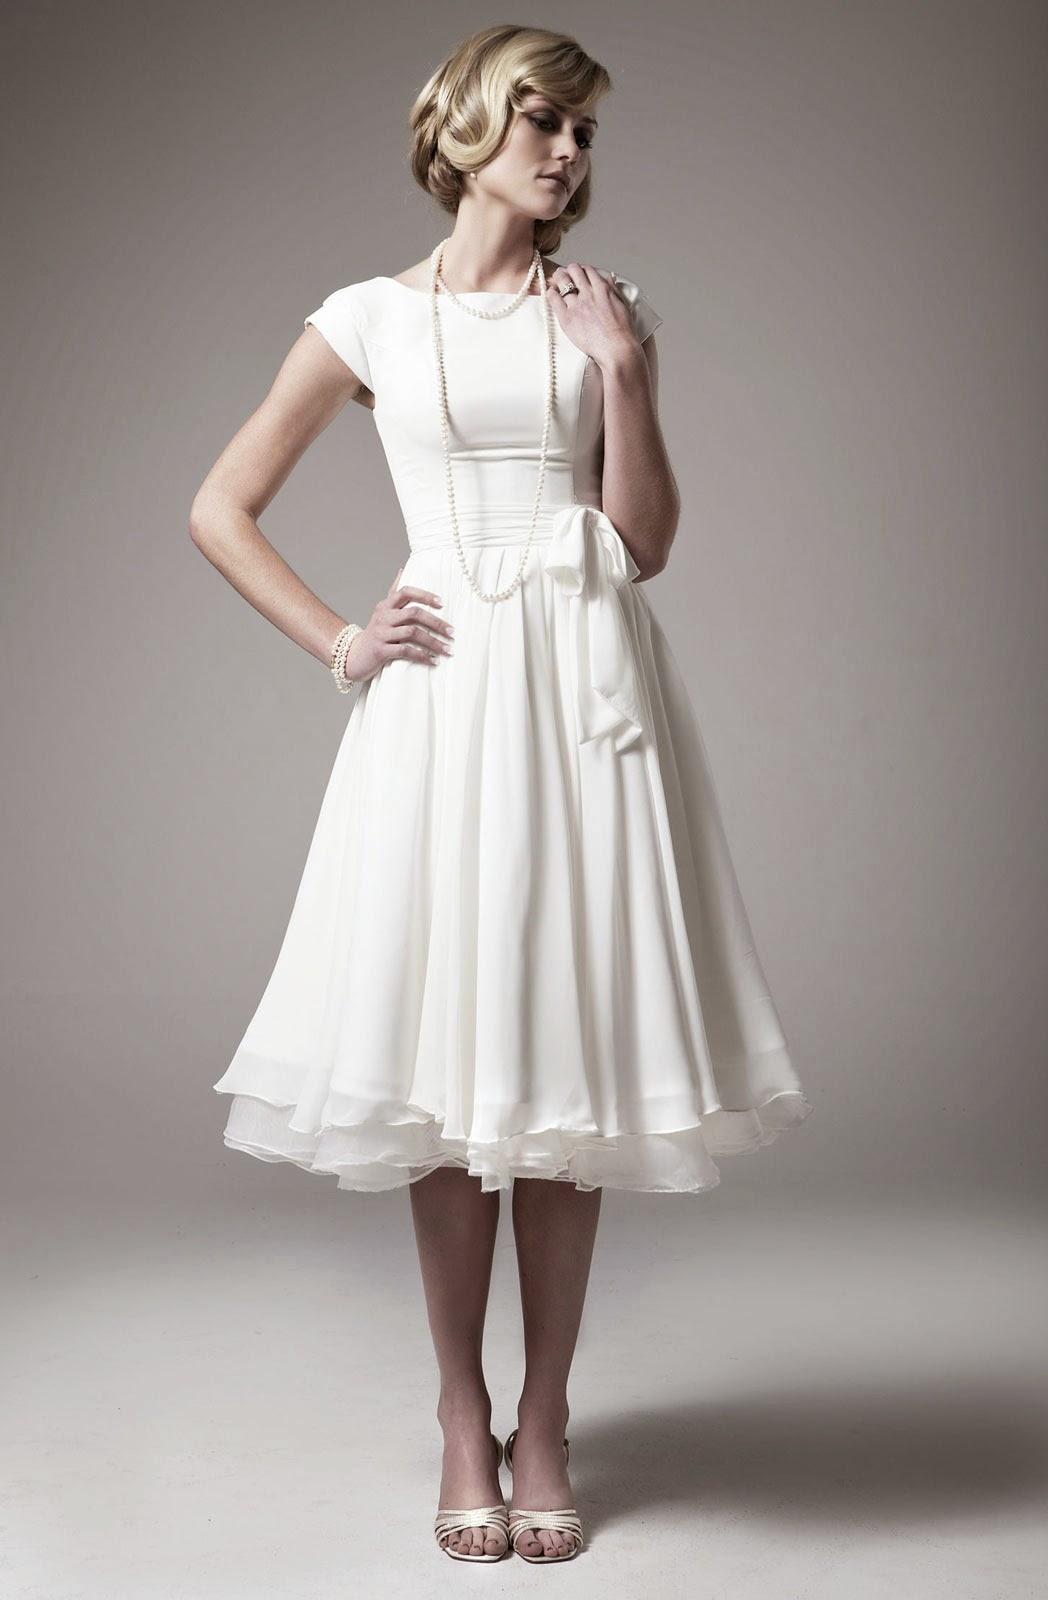 White Casual Wedding Dresses Photos HD Concepts Ideas